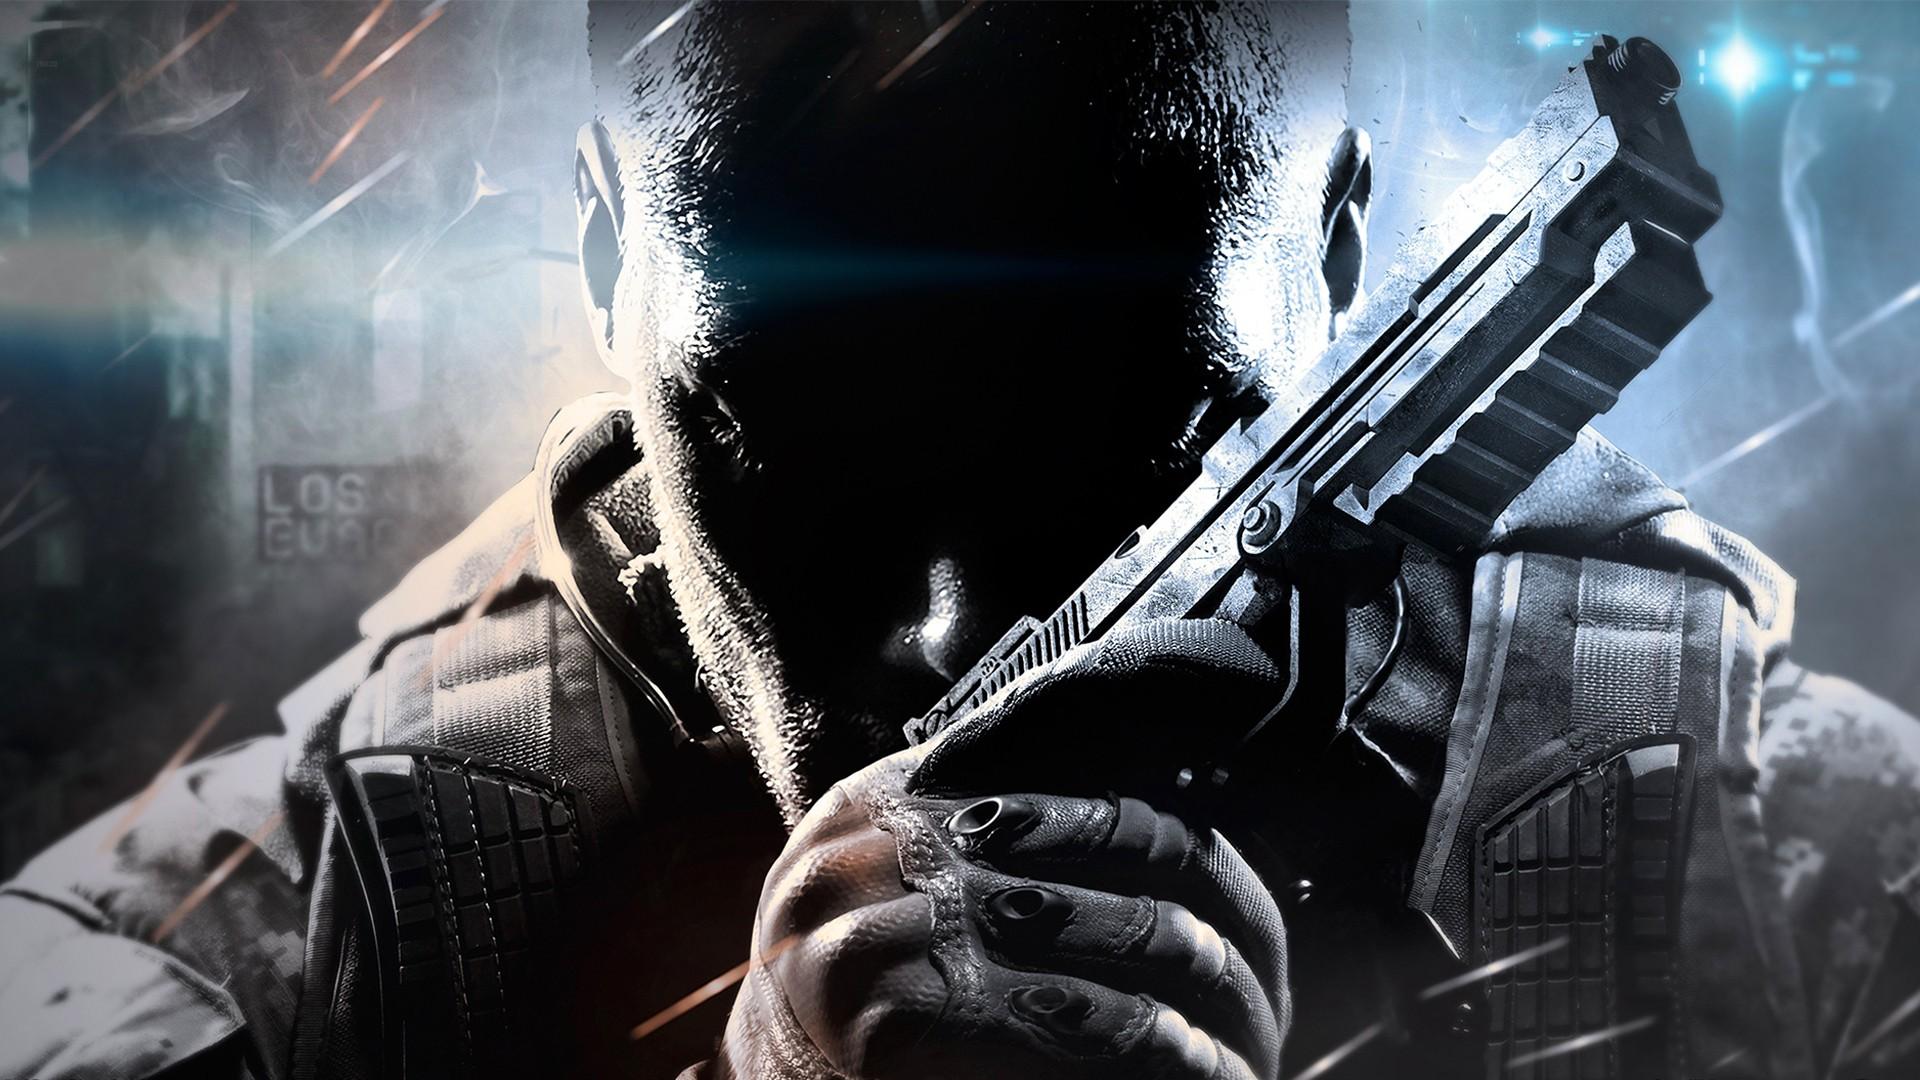 PC Call Of Duty Black Ops III